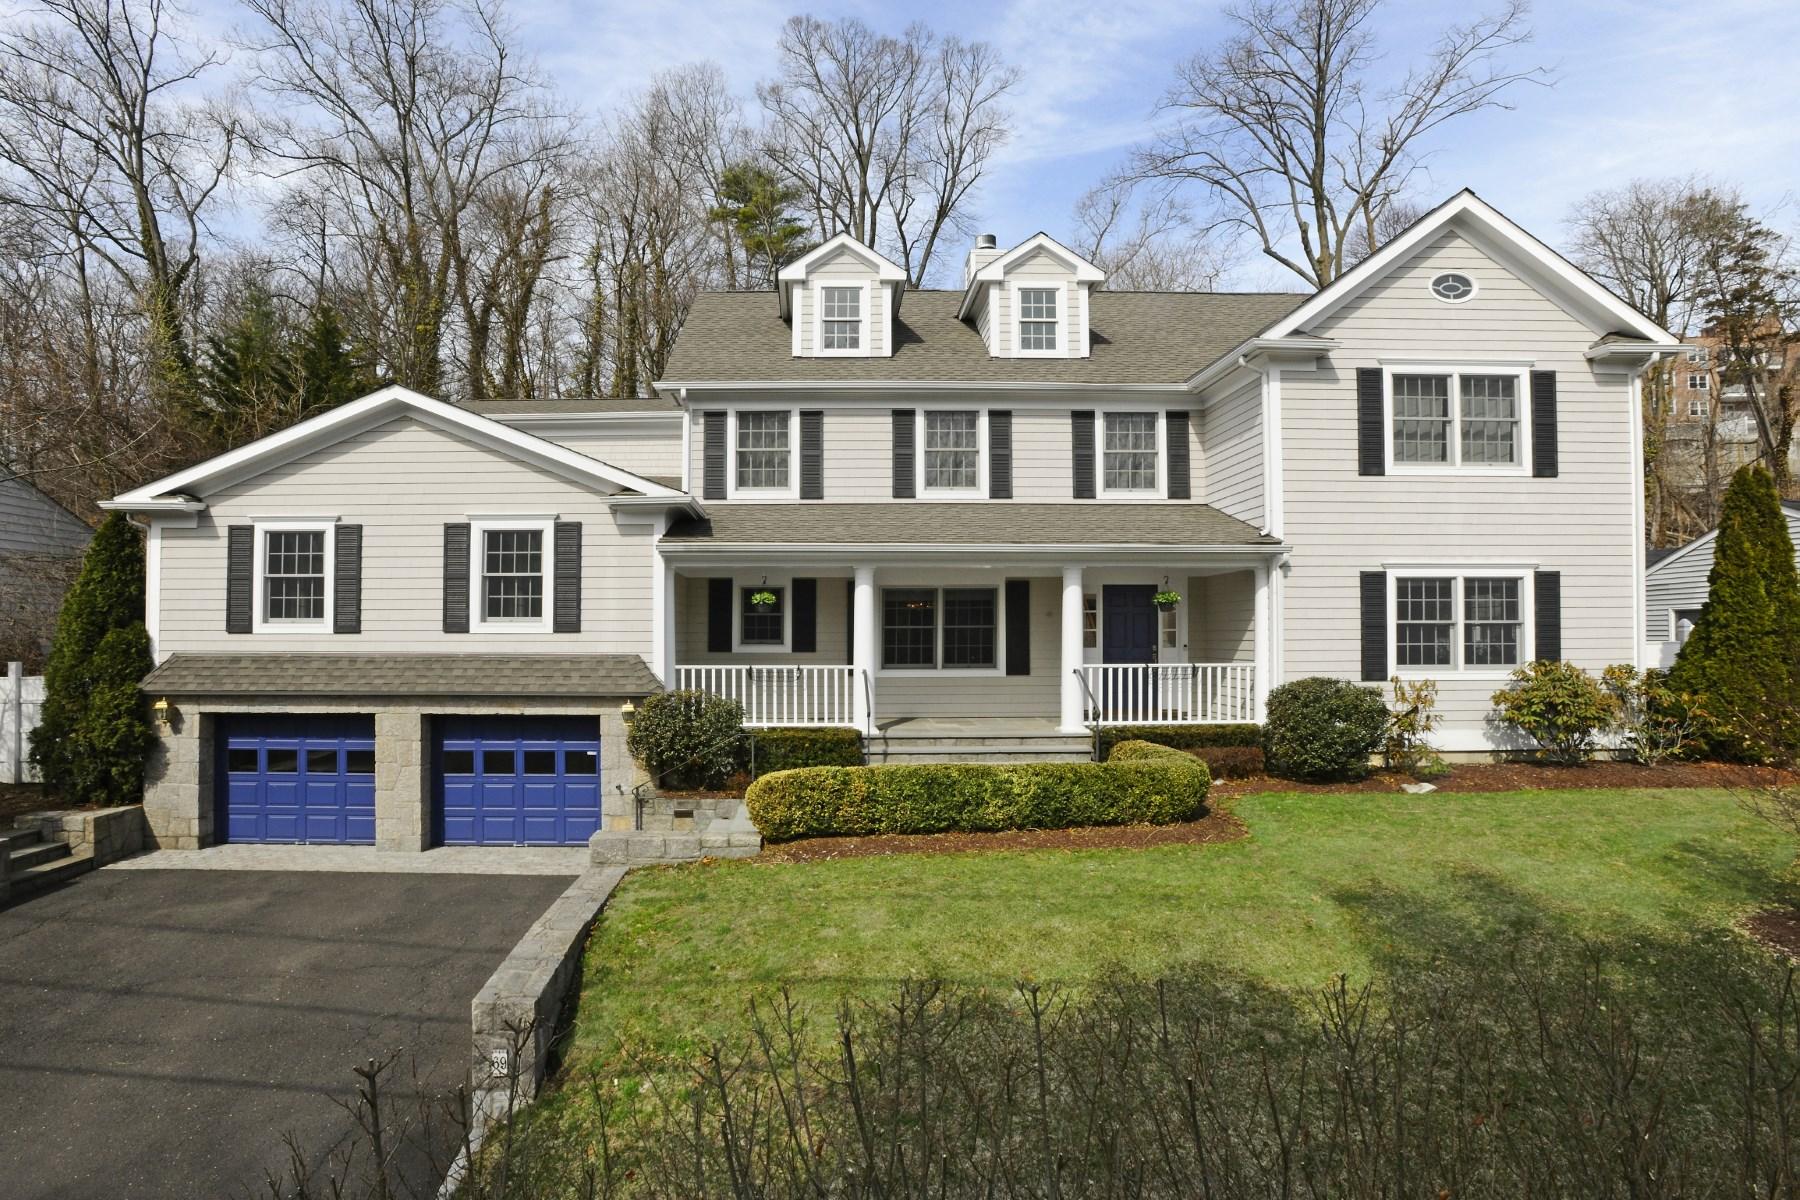 Casa para uma família para Venda às In-Town Living 69 Mallard Drive Central Greenwich, Greenwich, Connecticut 06830 Estados Unidos